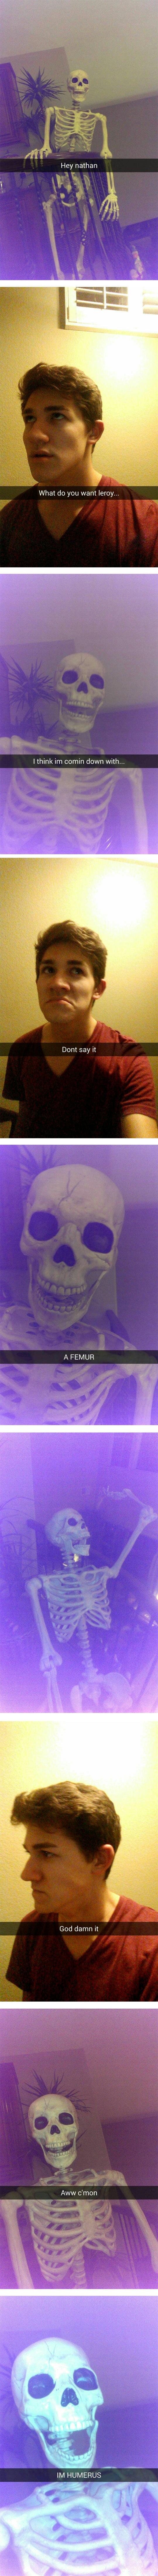 Skeleton Comedy